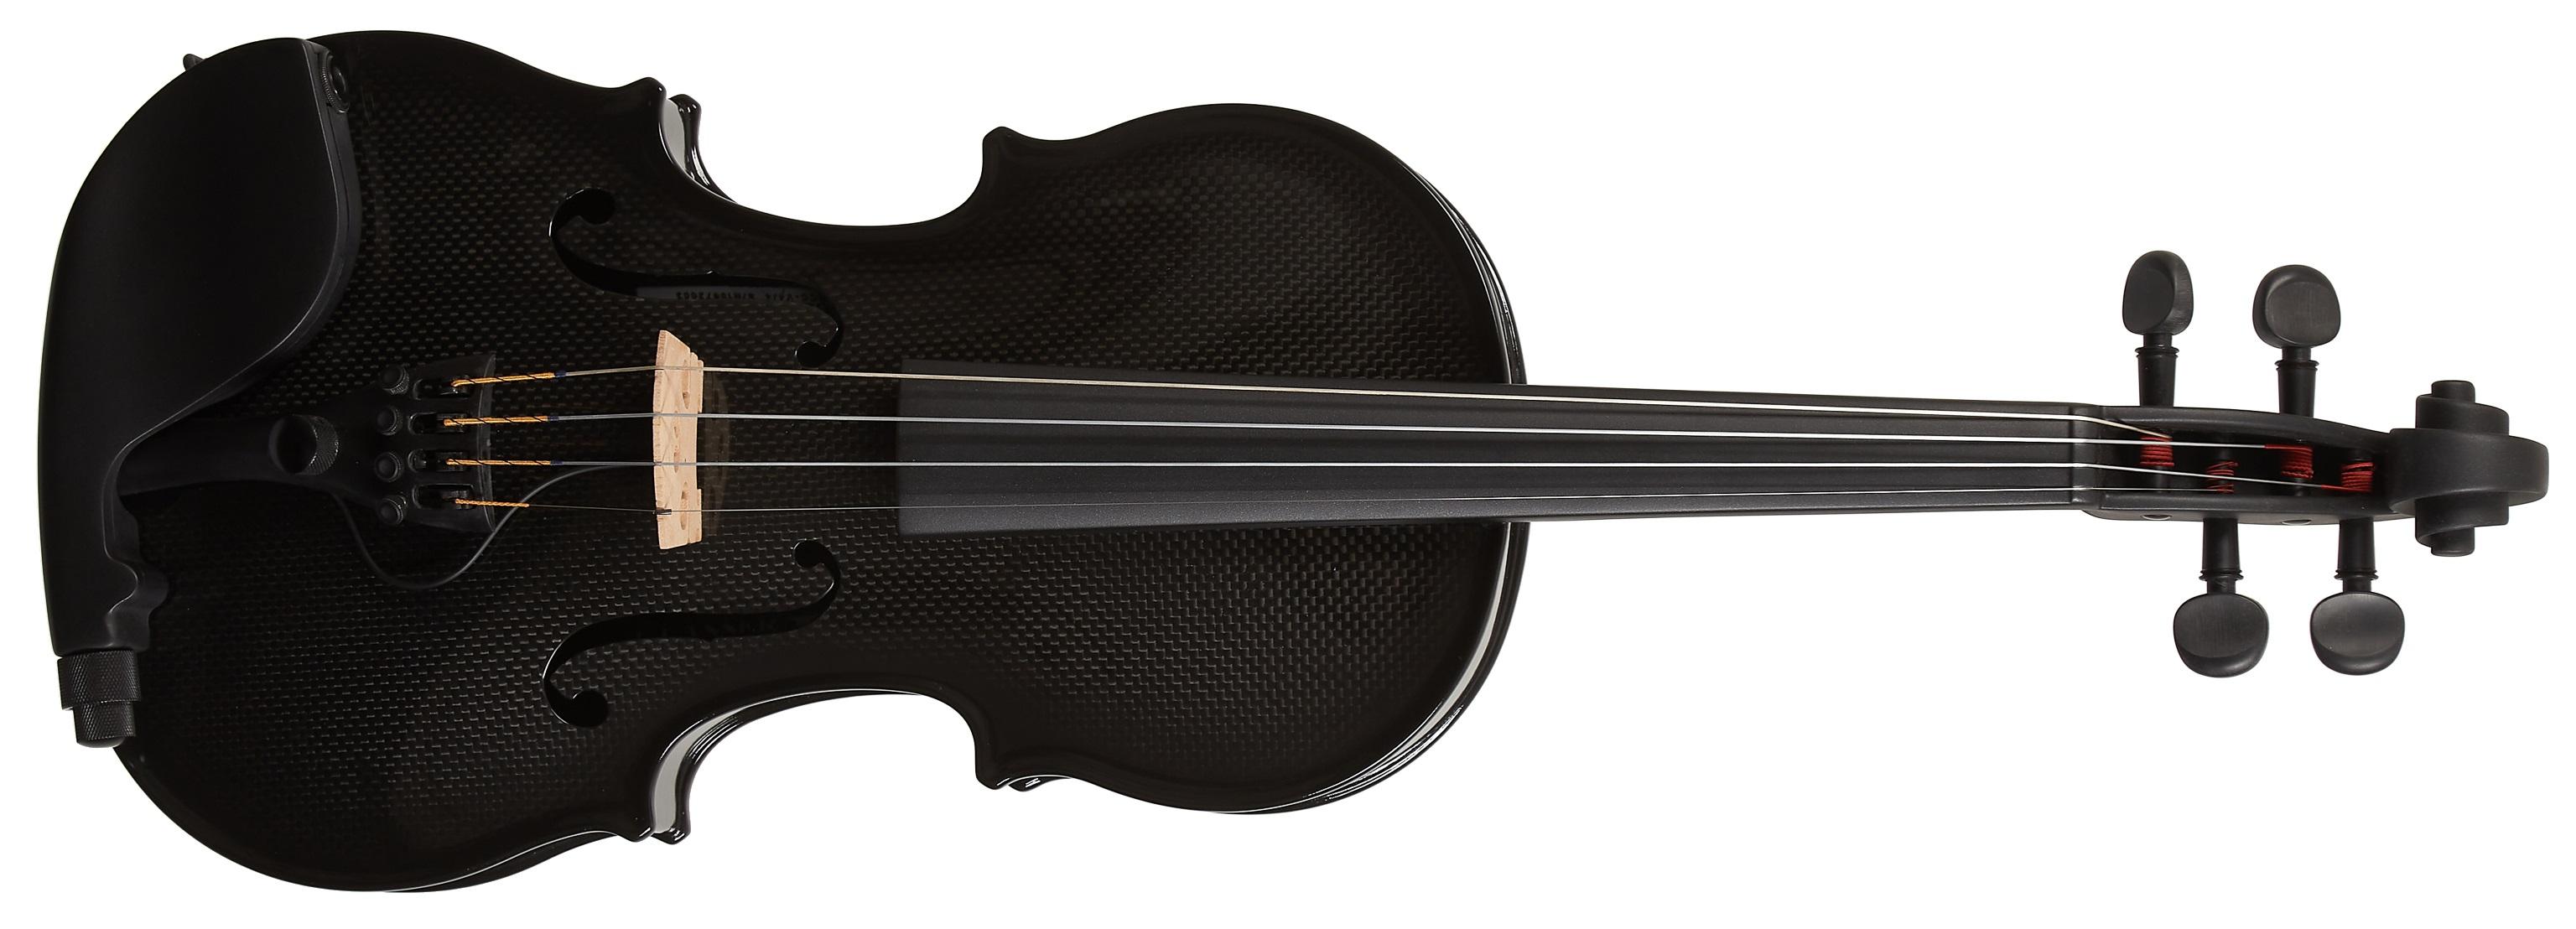 Glasser CC Violin Acoustic Electric Black